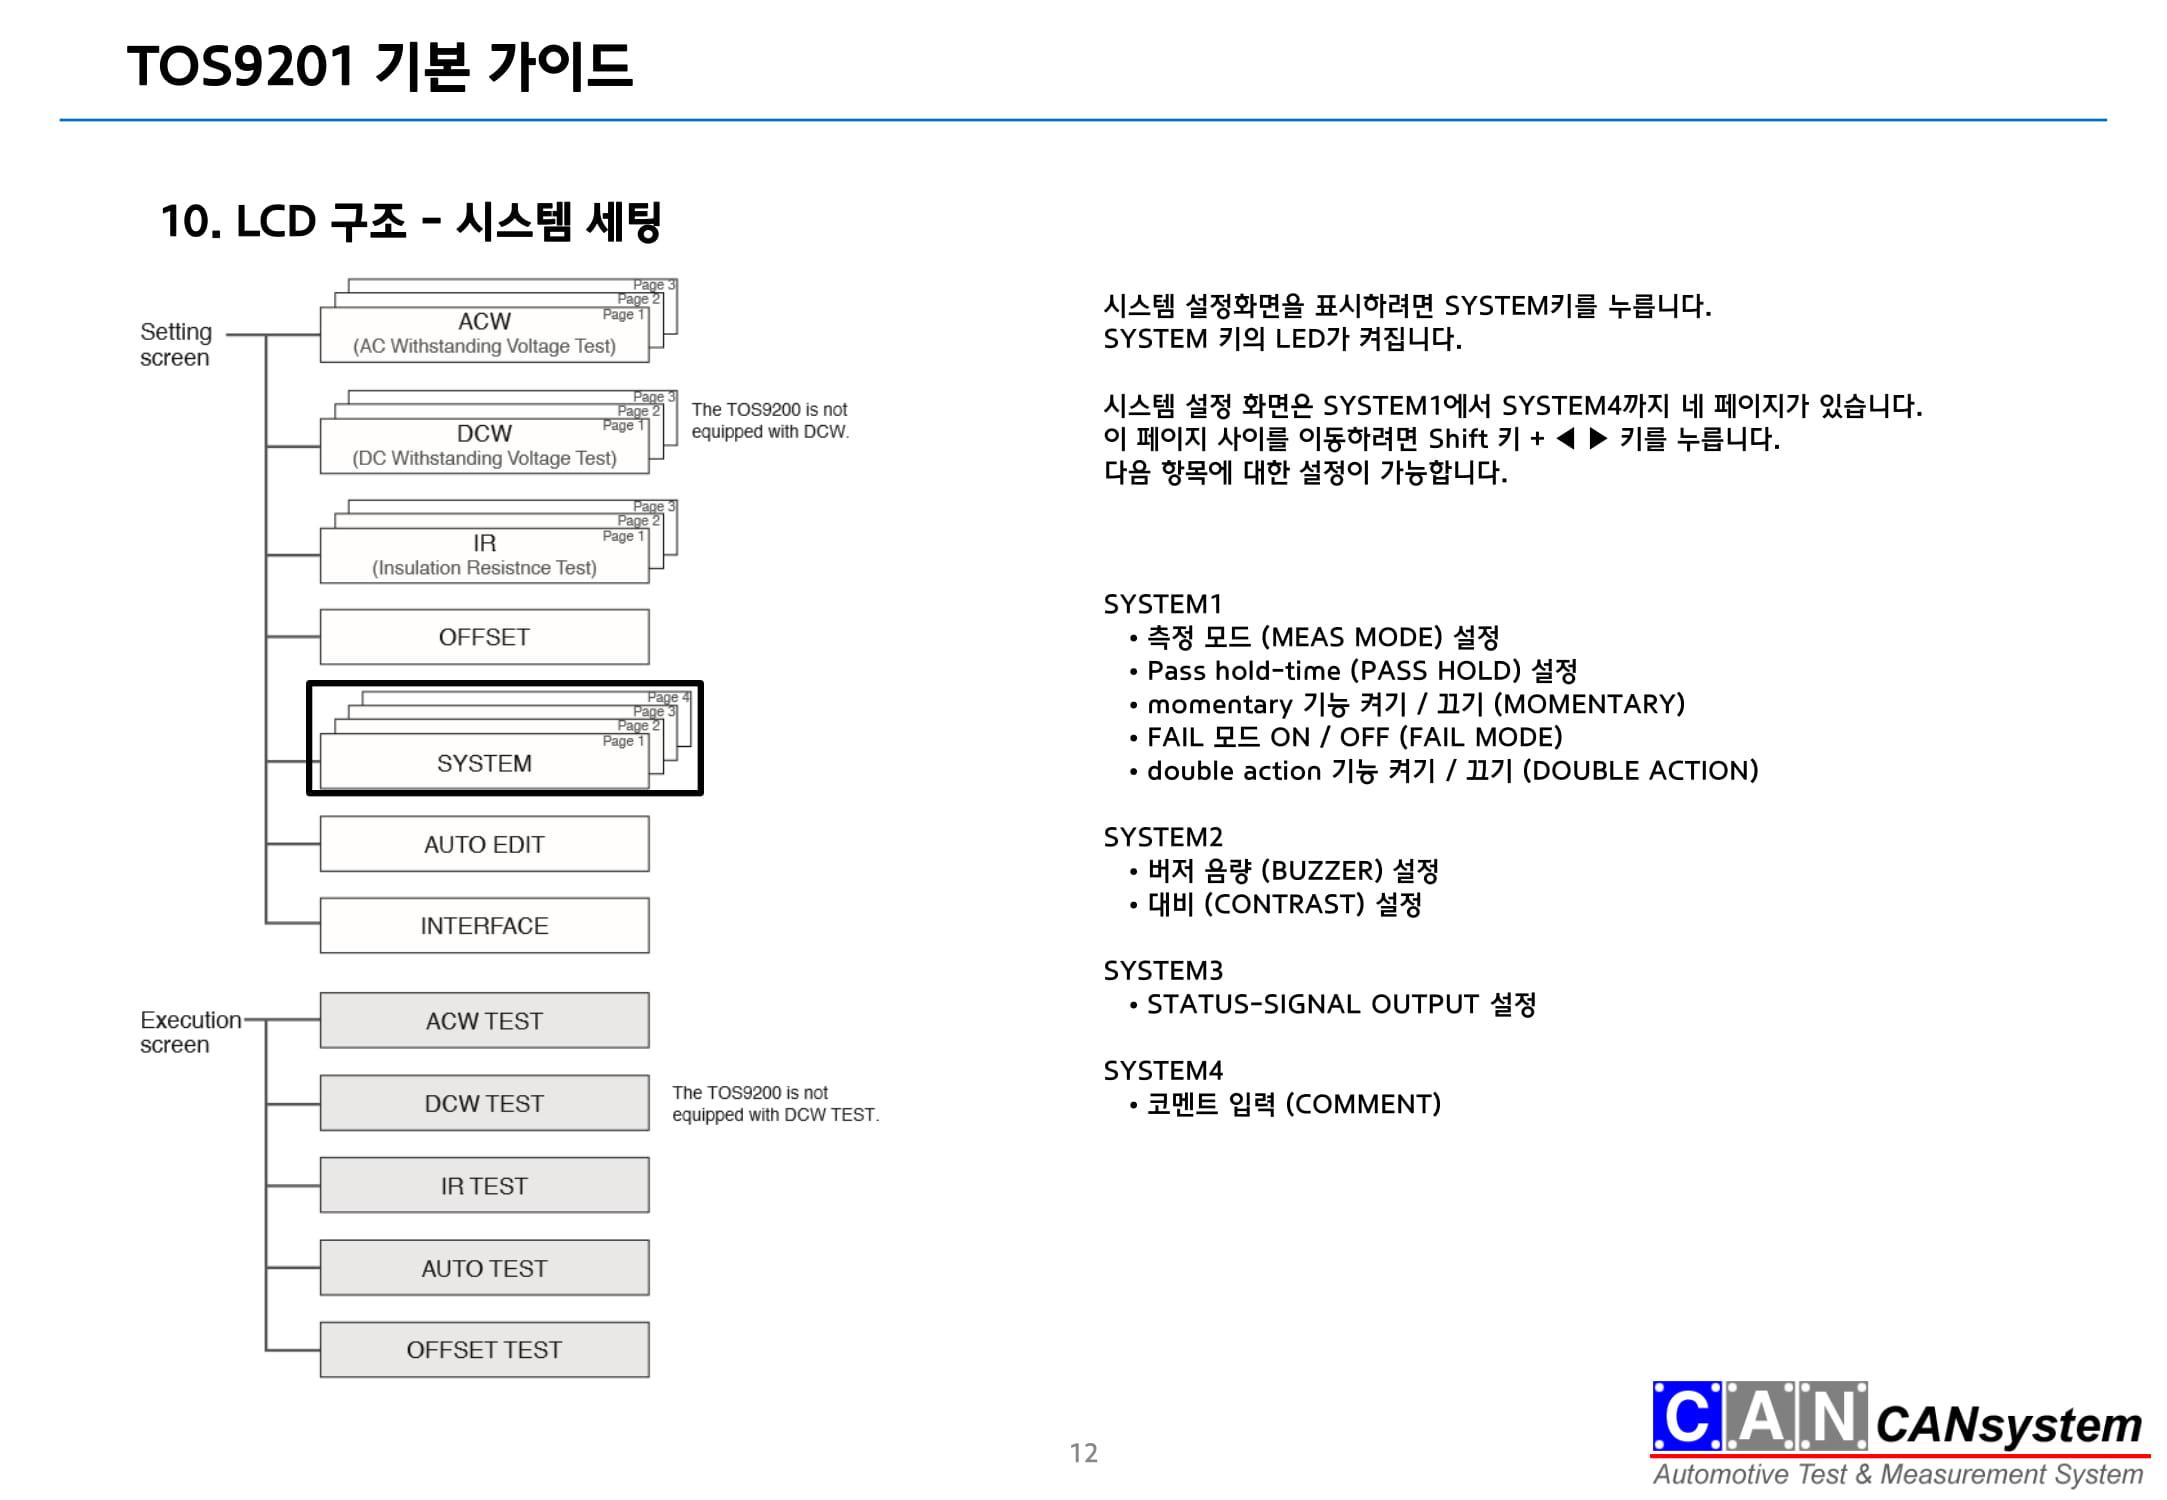 KIKUSUI TOS9201 국문 이용가이드-12.jpg